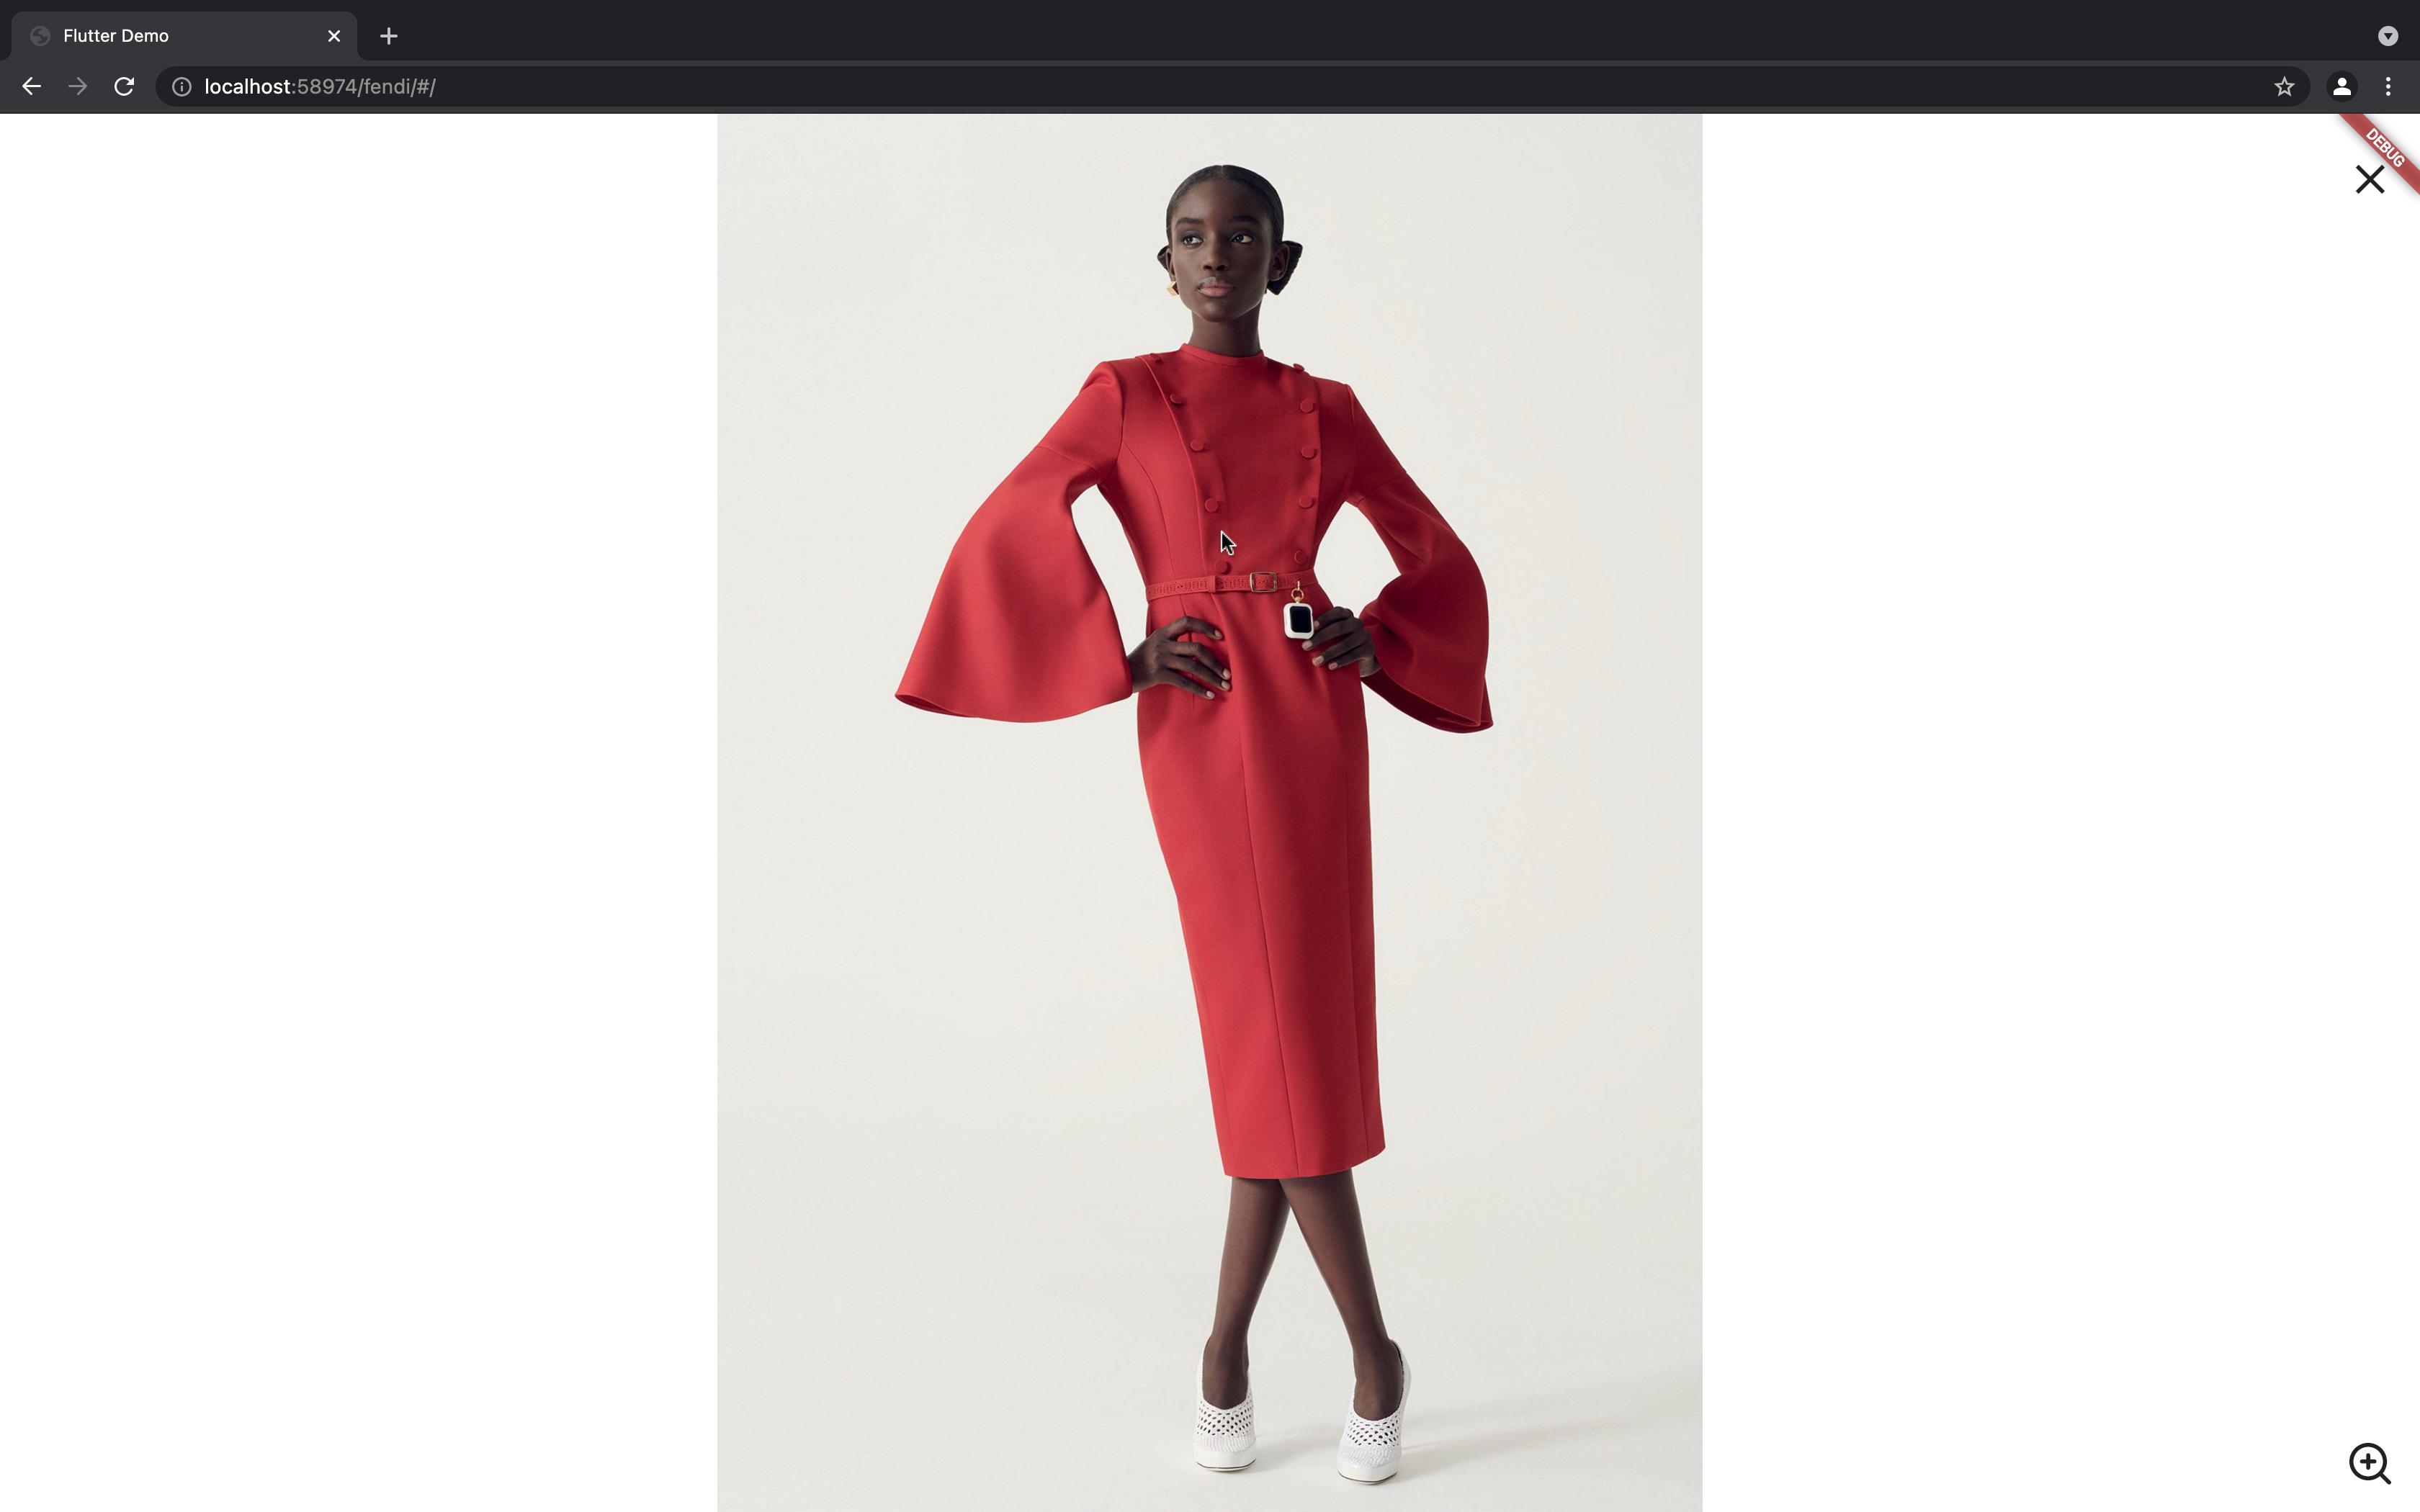 Fendi Women's Lookbook created with Flutter